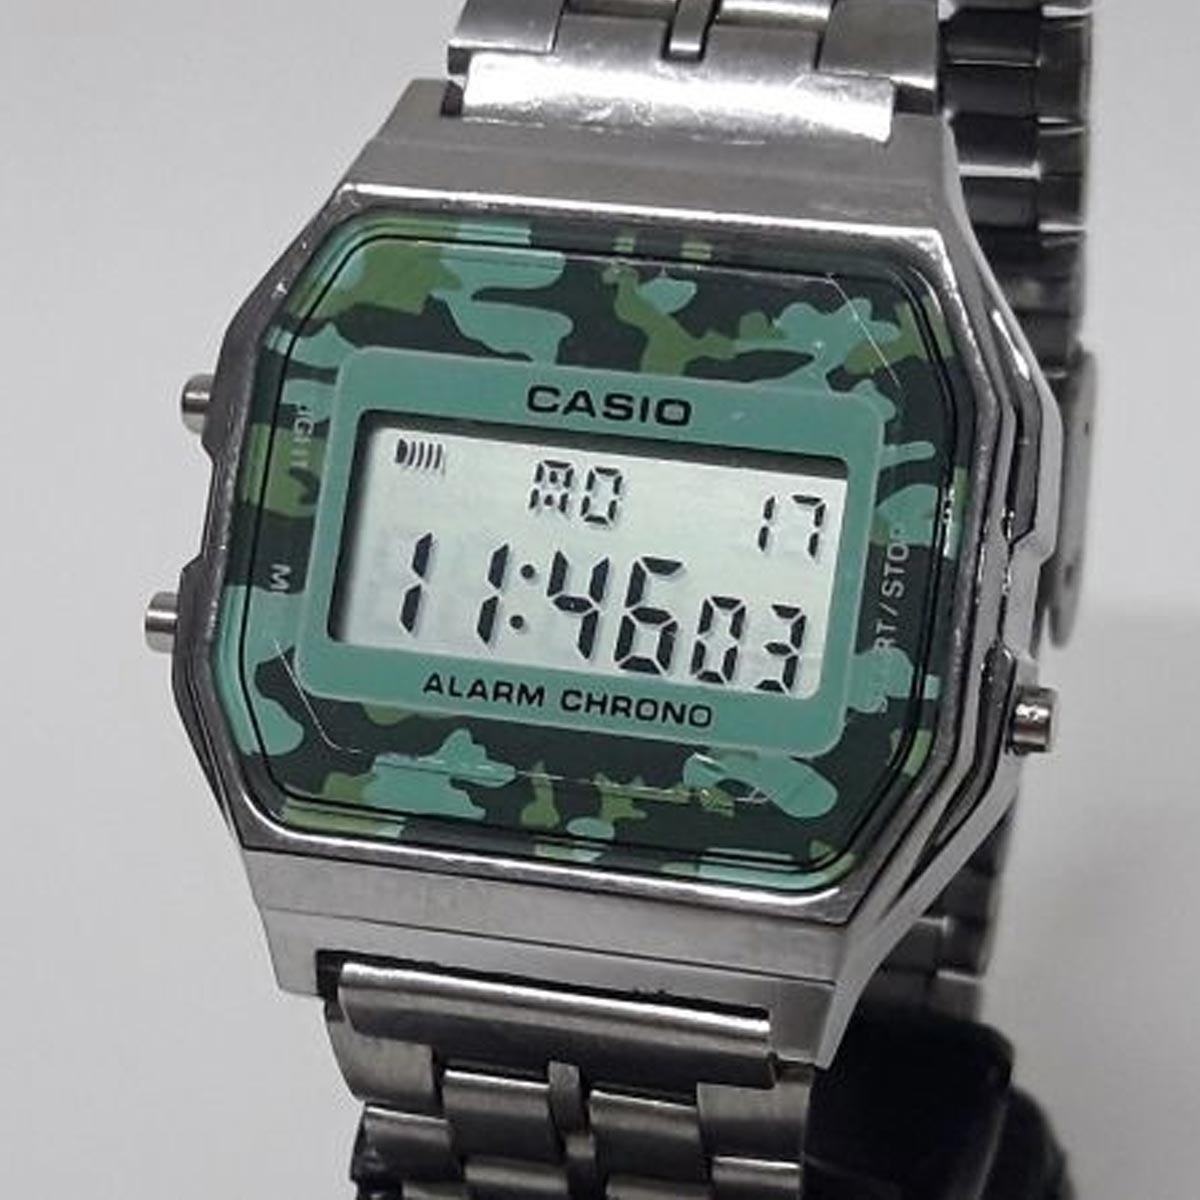 f68880f9c50 relógio casio a159w camuflado prata vintage retrô. Carregando zoom.